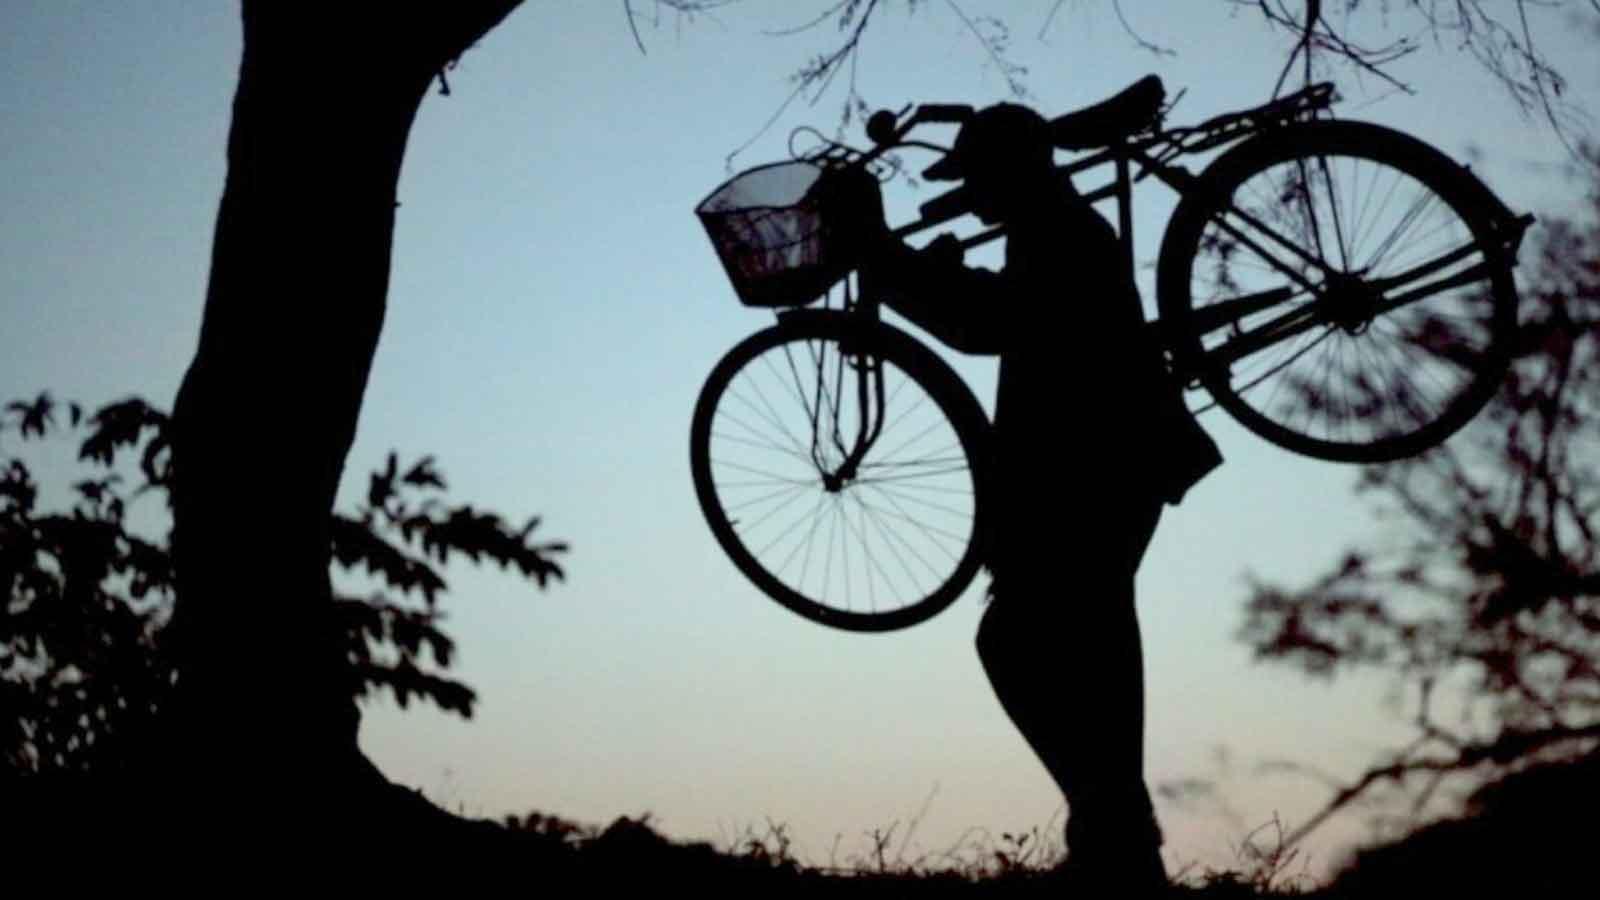 wacana-sinema-dunia-2015_13-my-bicycle